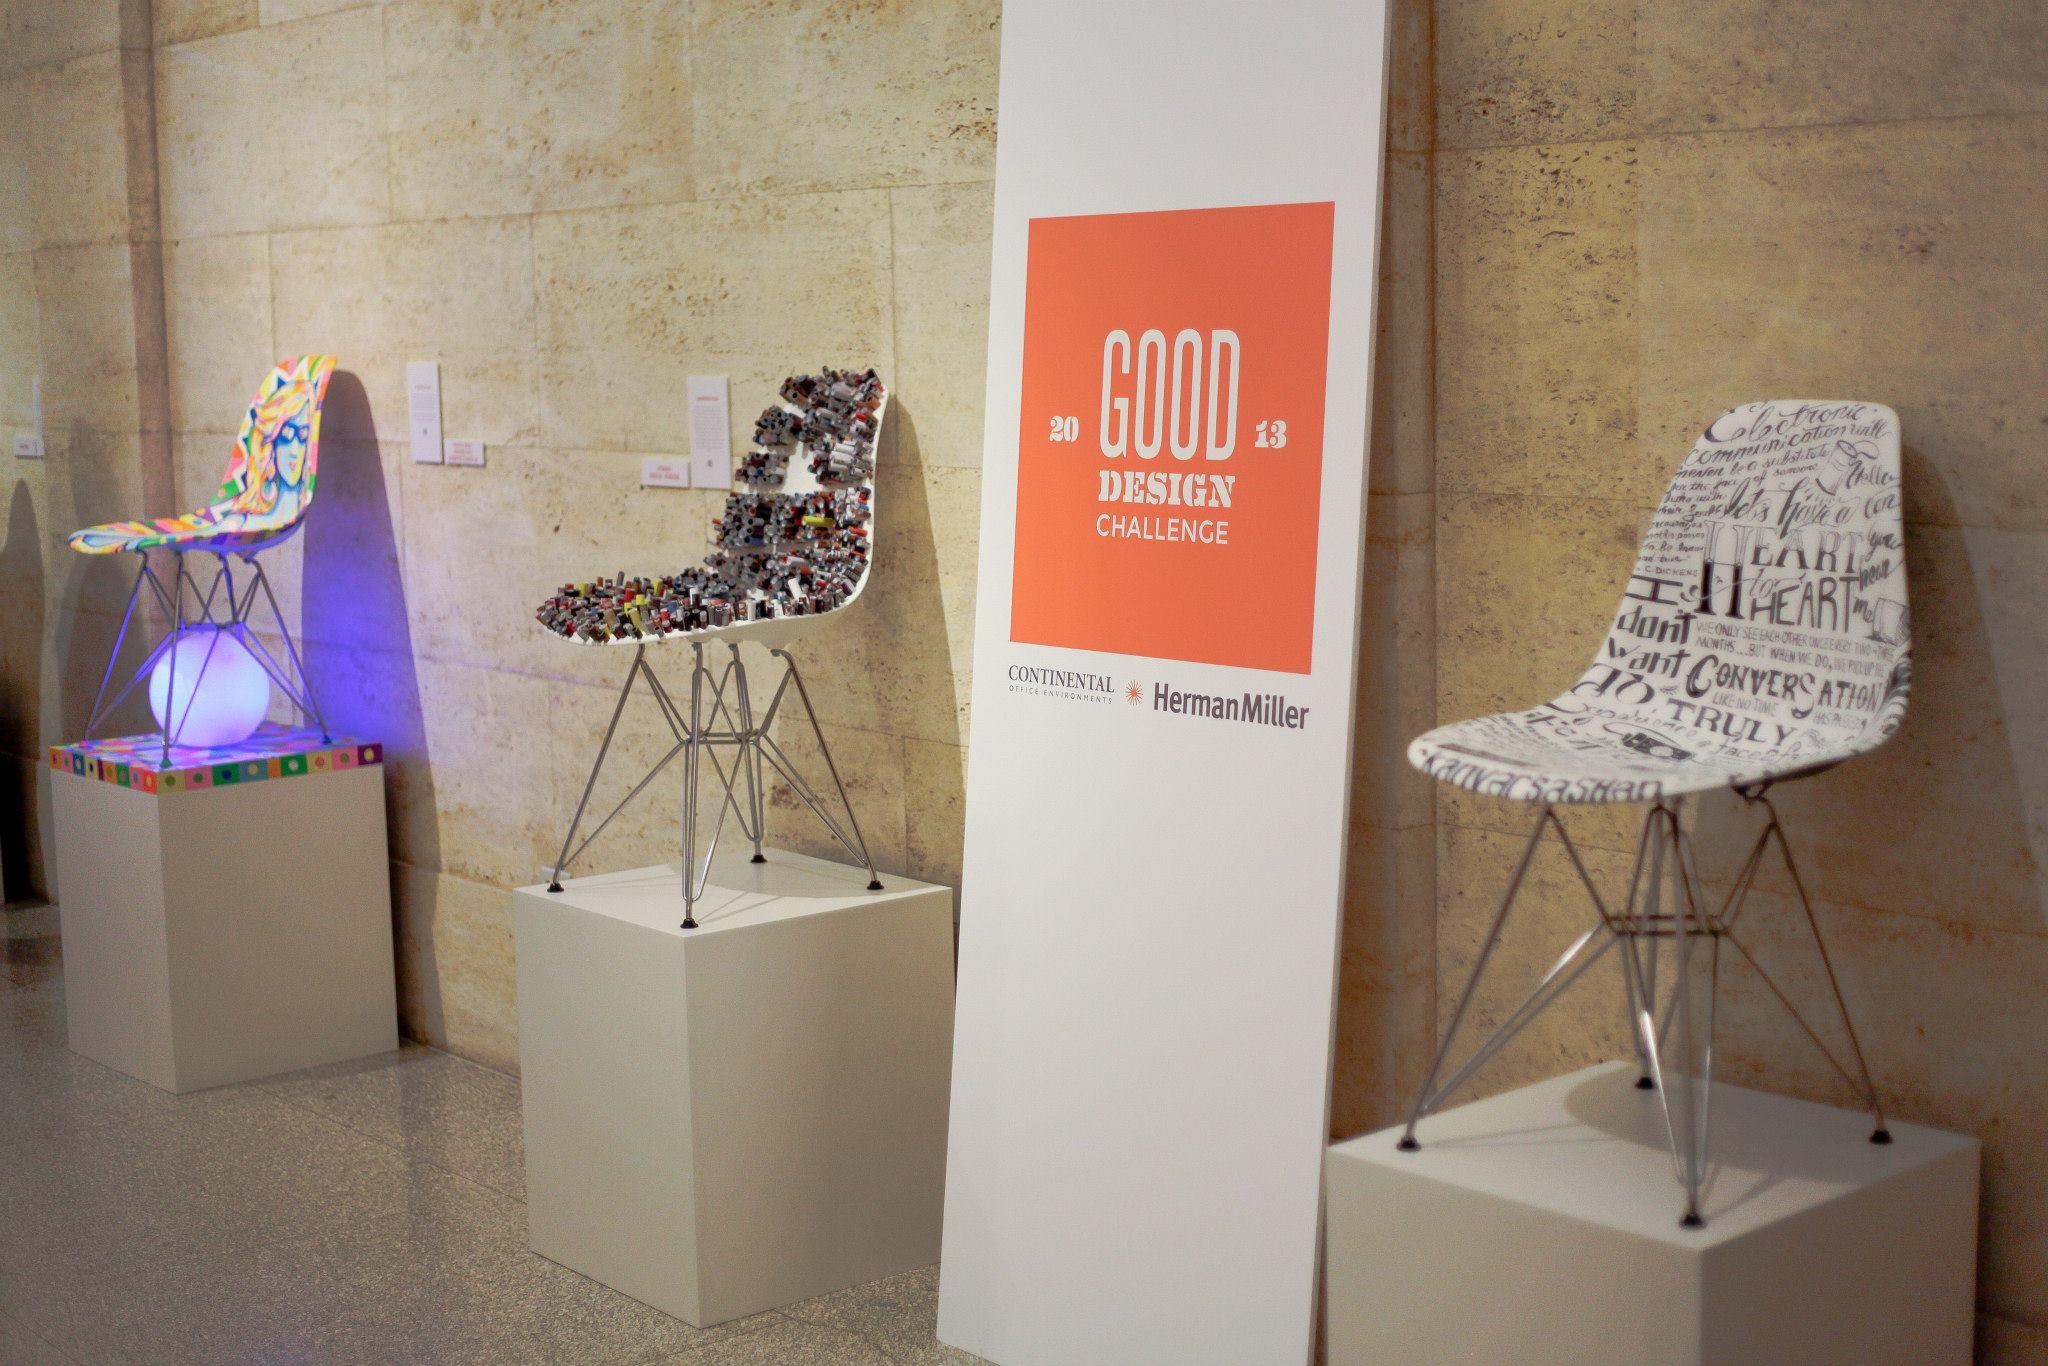 The Good Design Challenge 2013